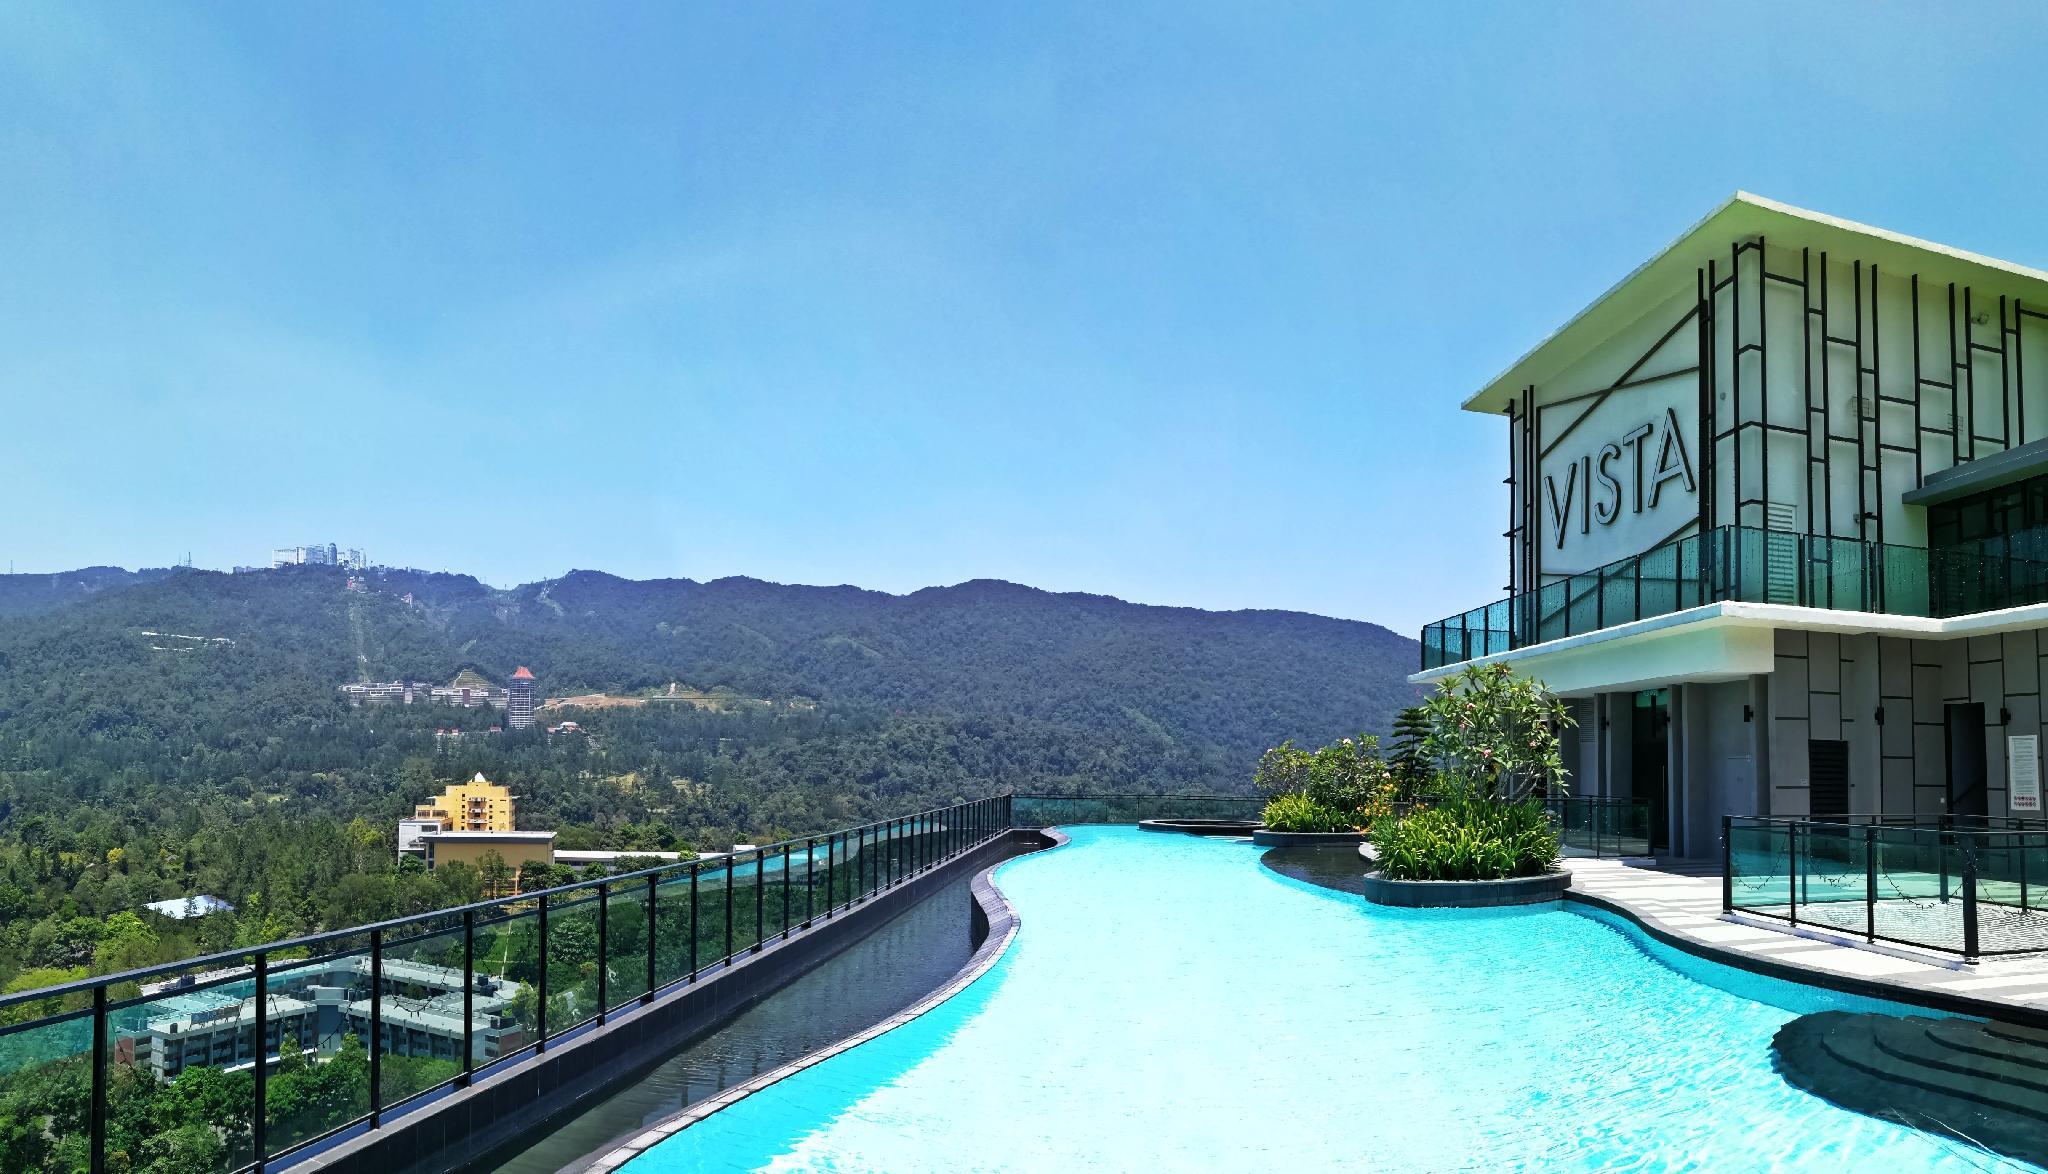 OwnAstay Vista Residences @ Genting Highlands, Bentong